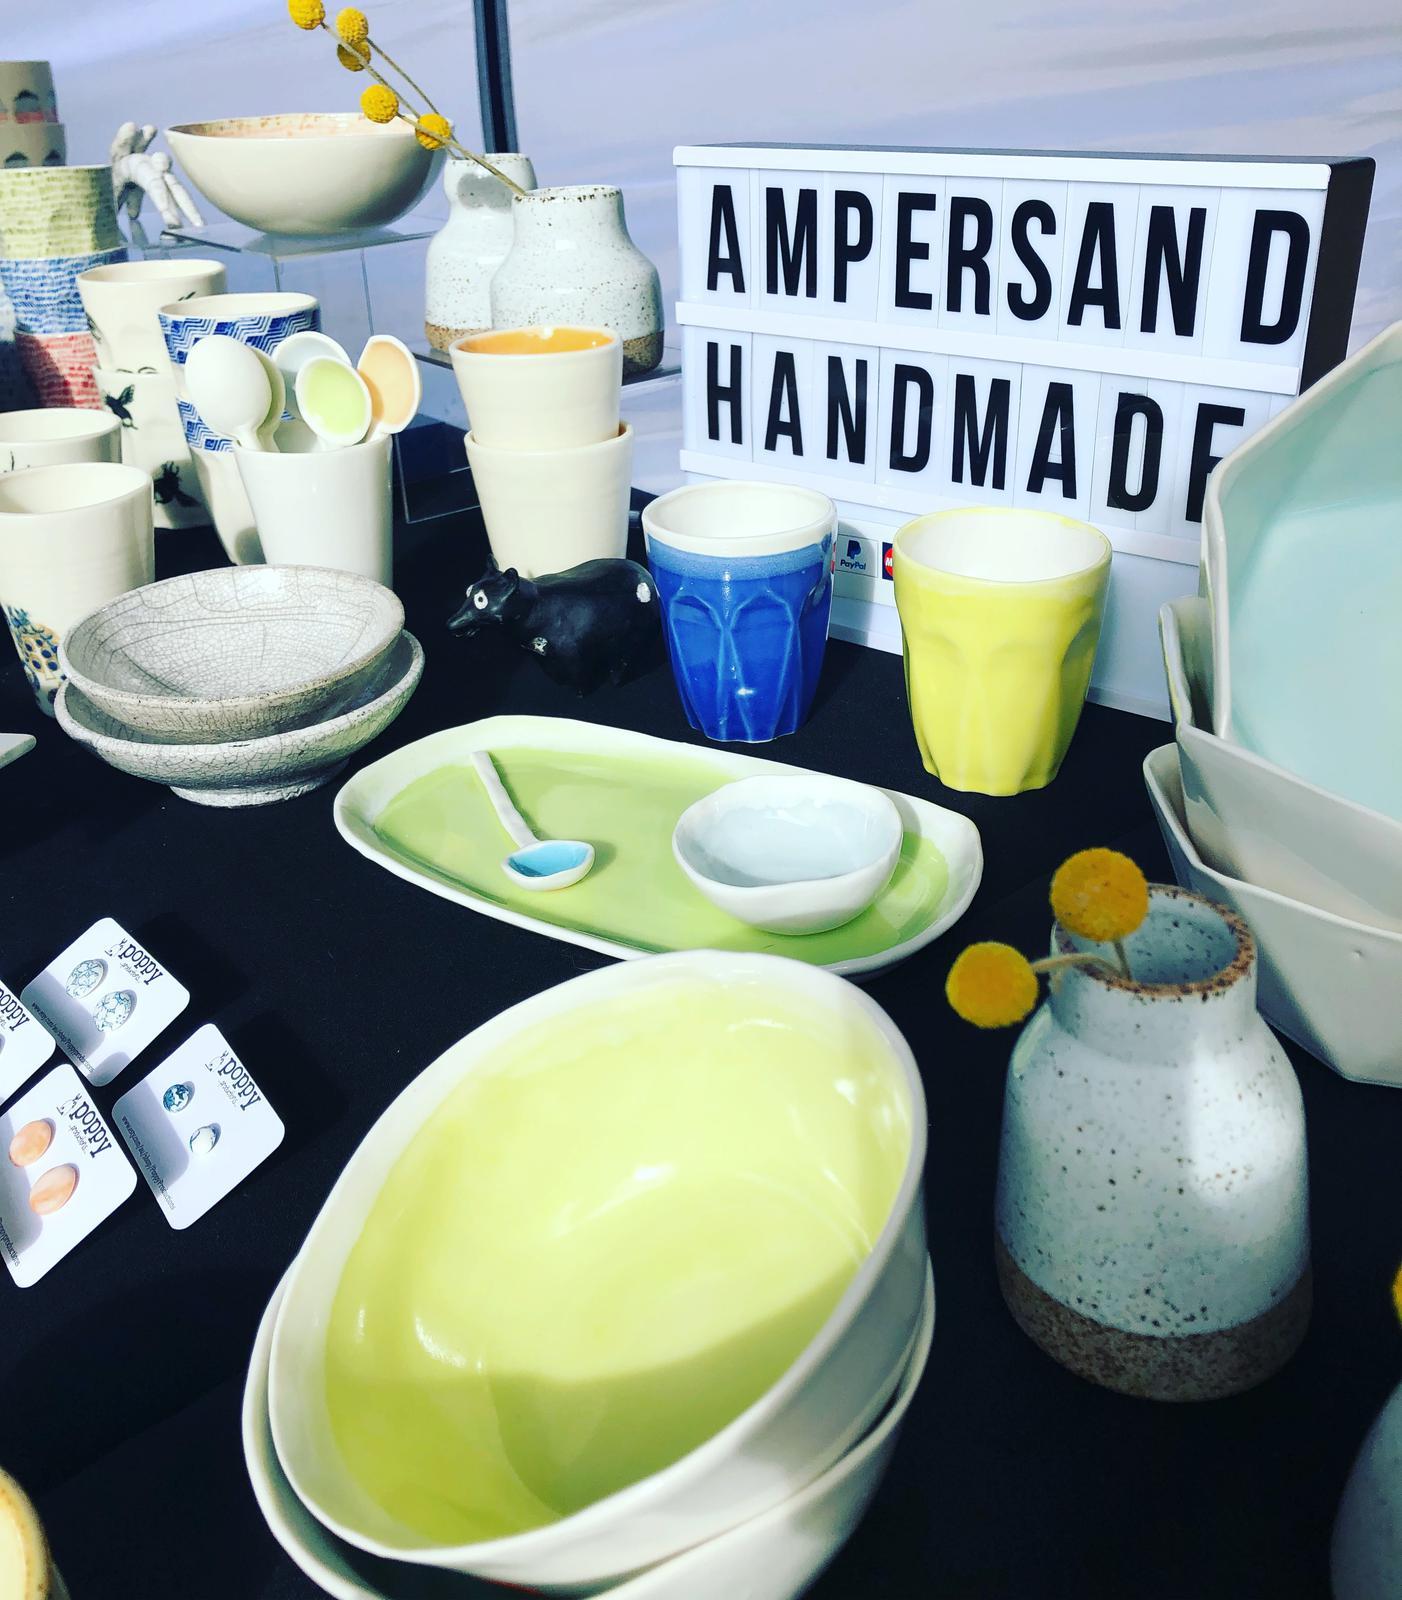 Ampersand Handmade